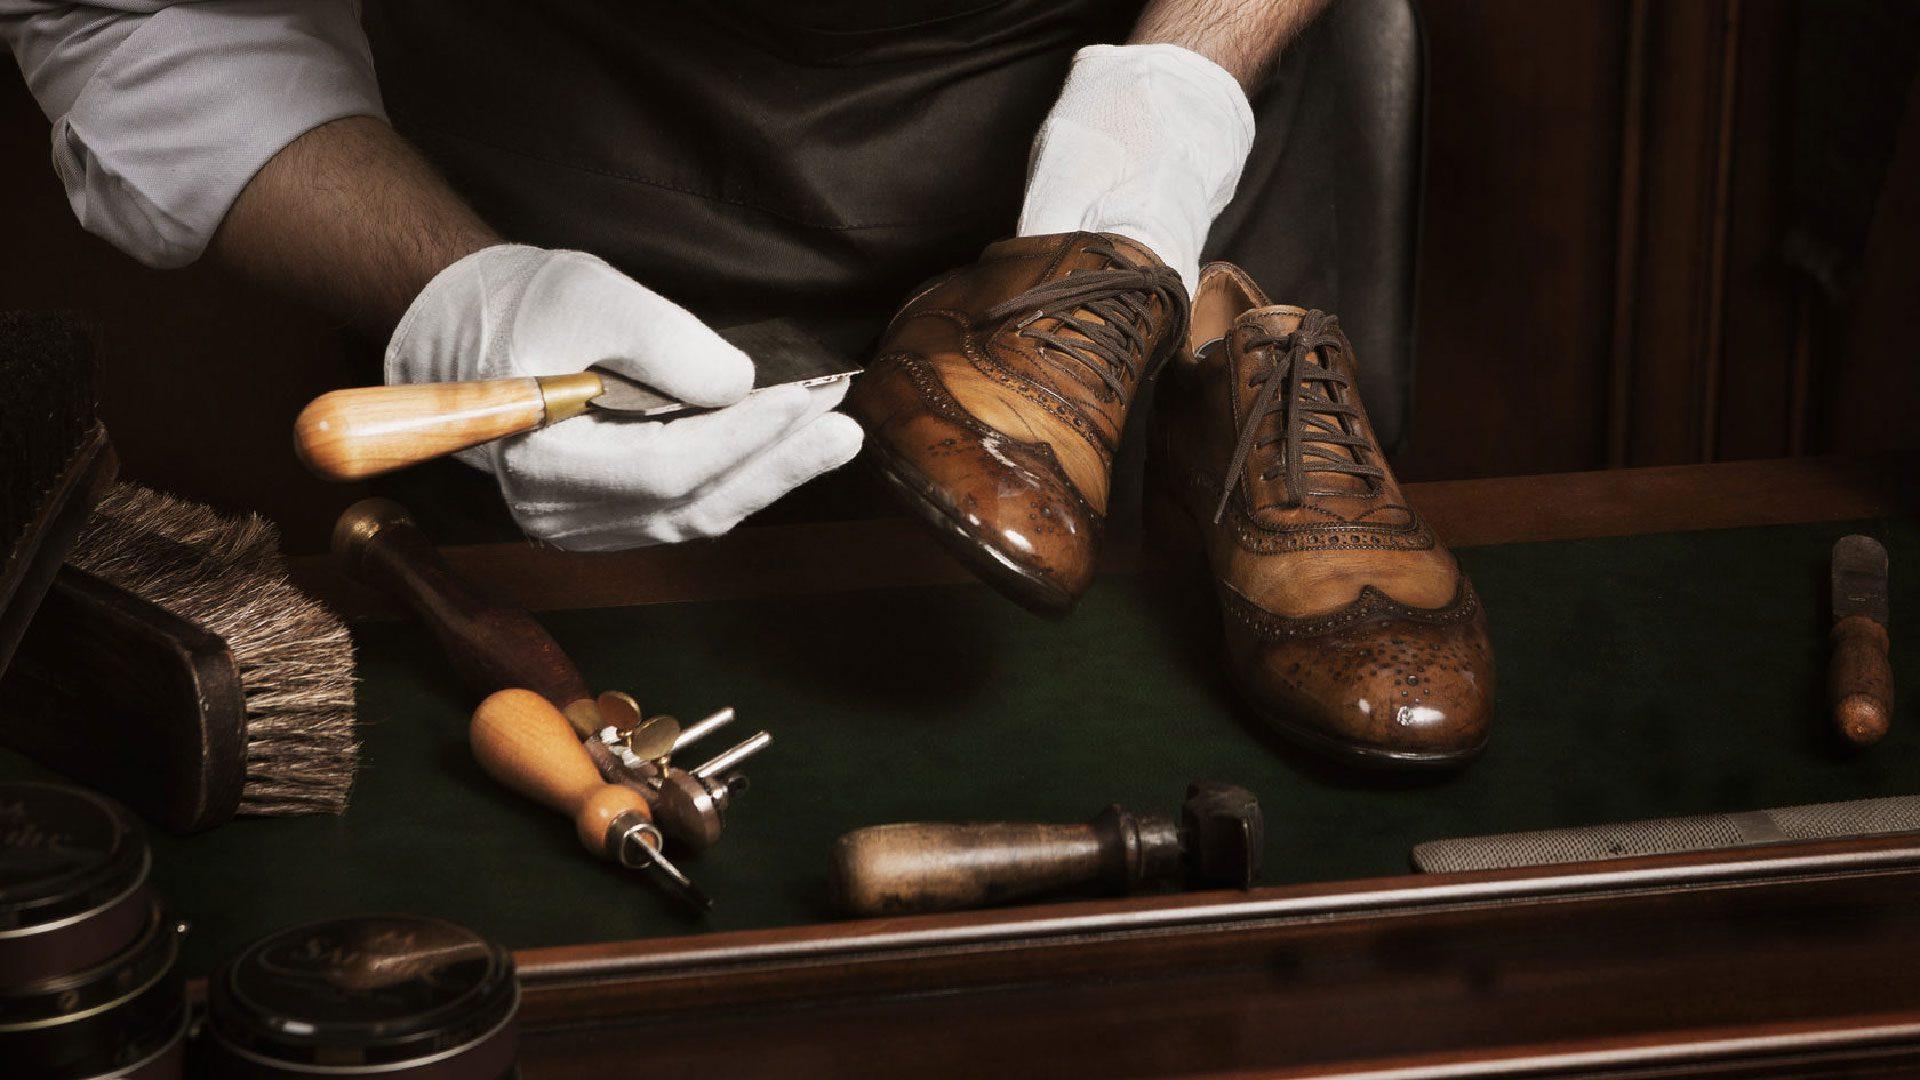 услуги по ремонту обуви